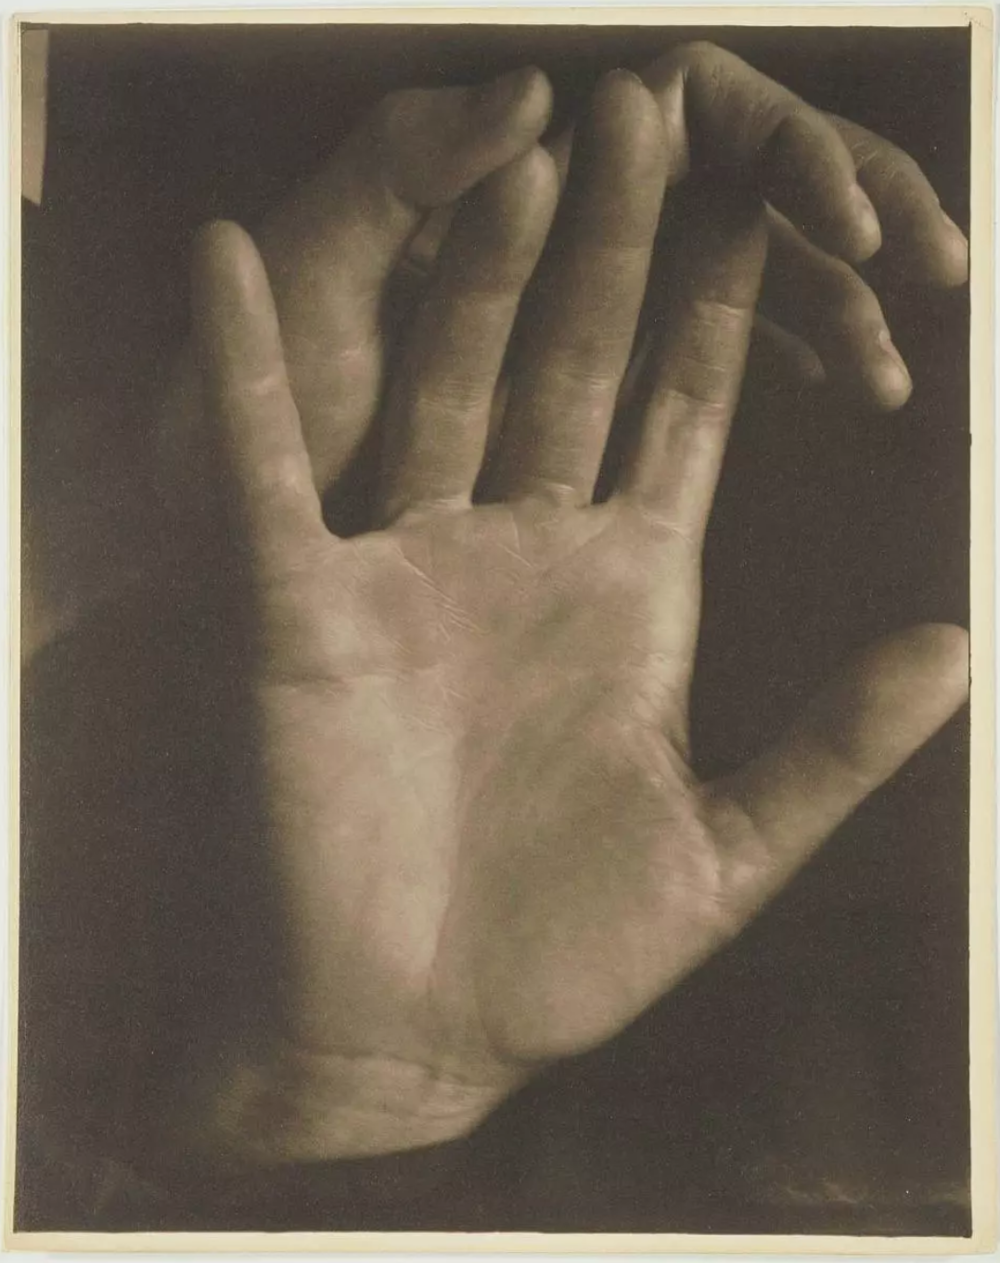 Rebecca's Hands , Paul Strand, 1923